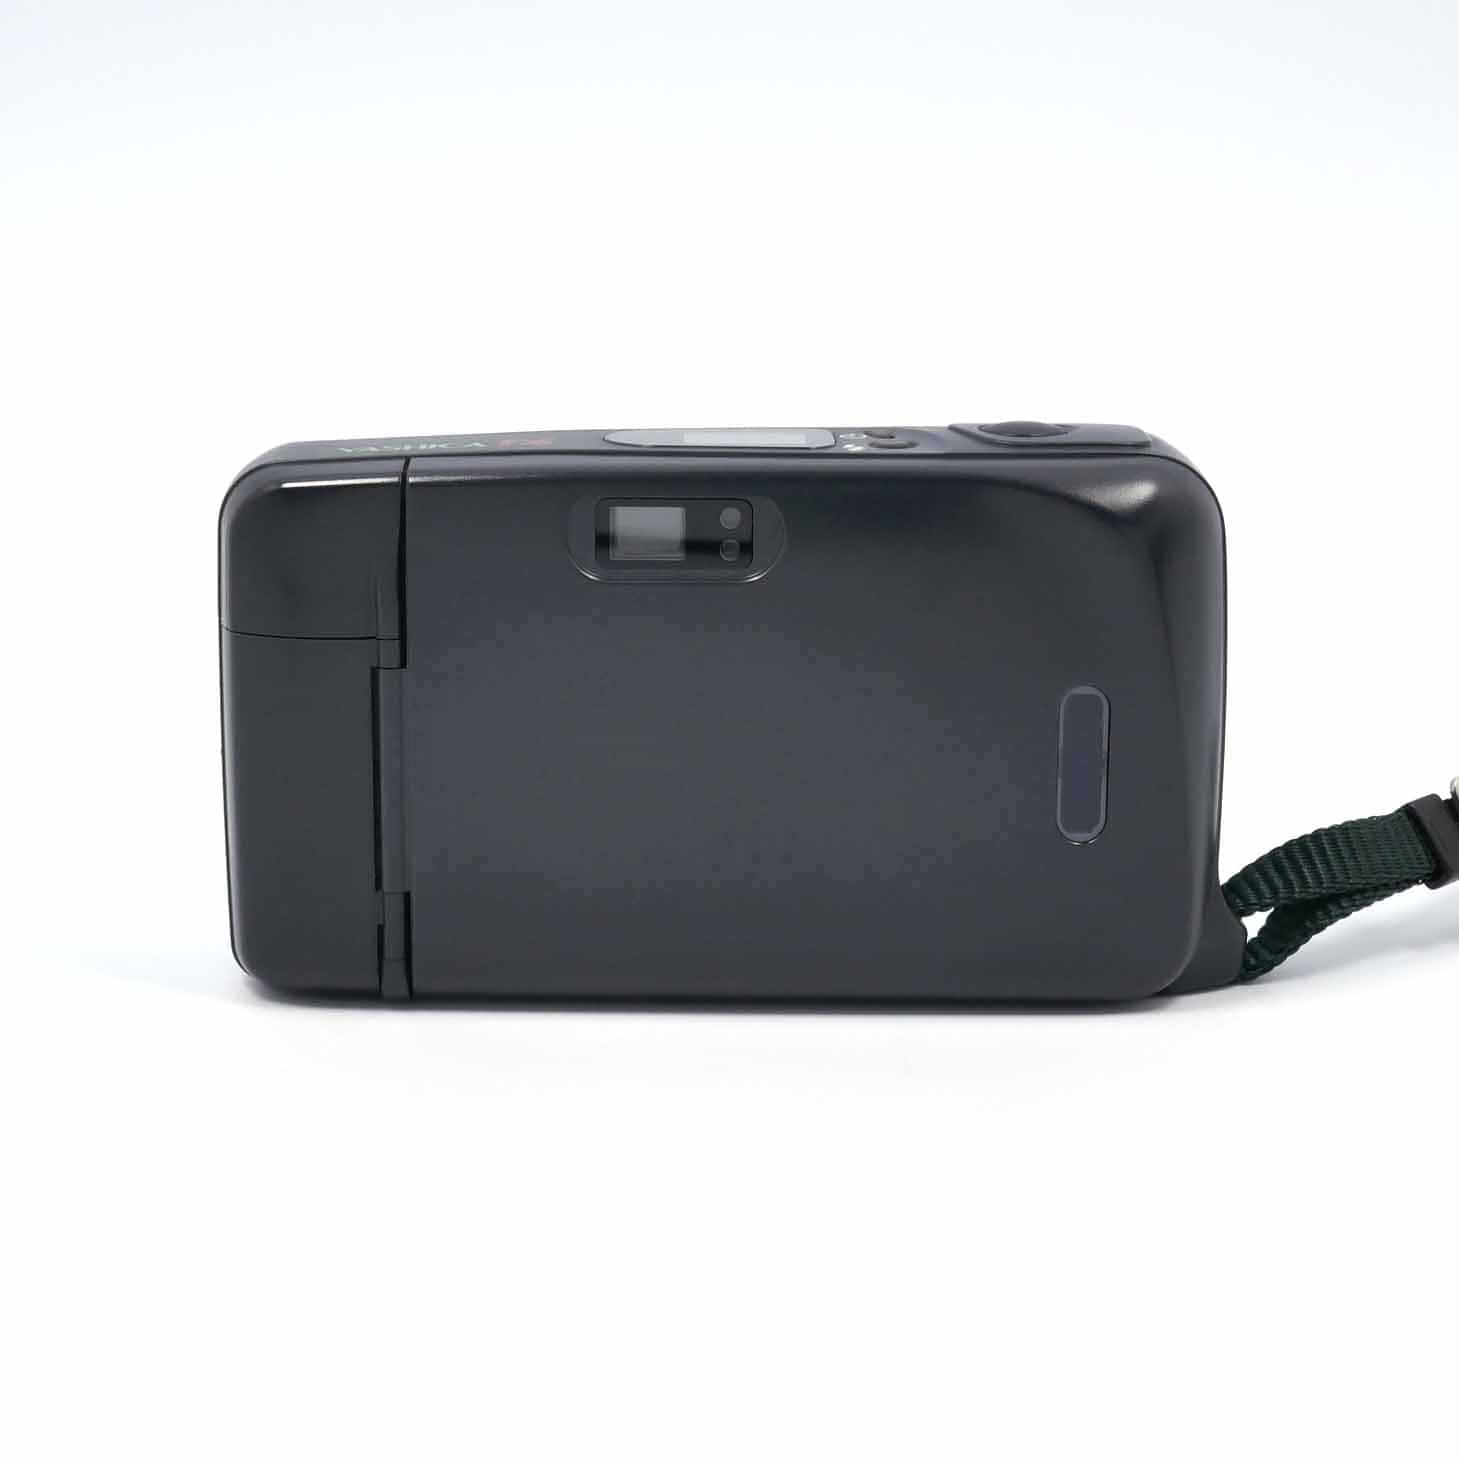 clean-cameras-Yashica-T4-Safari-03